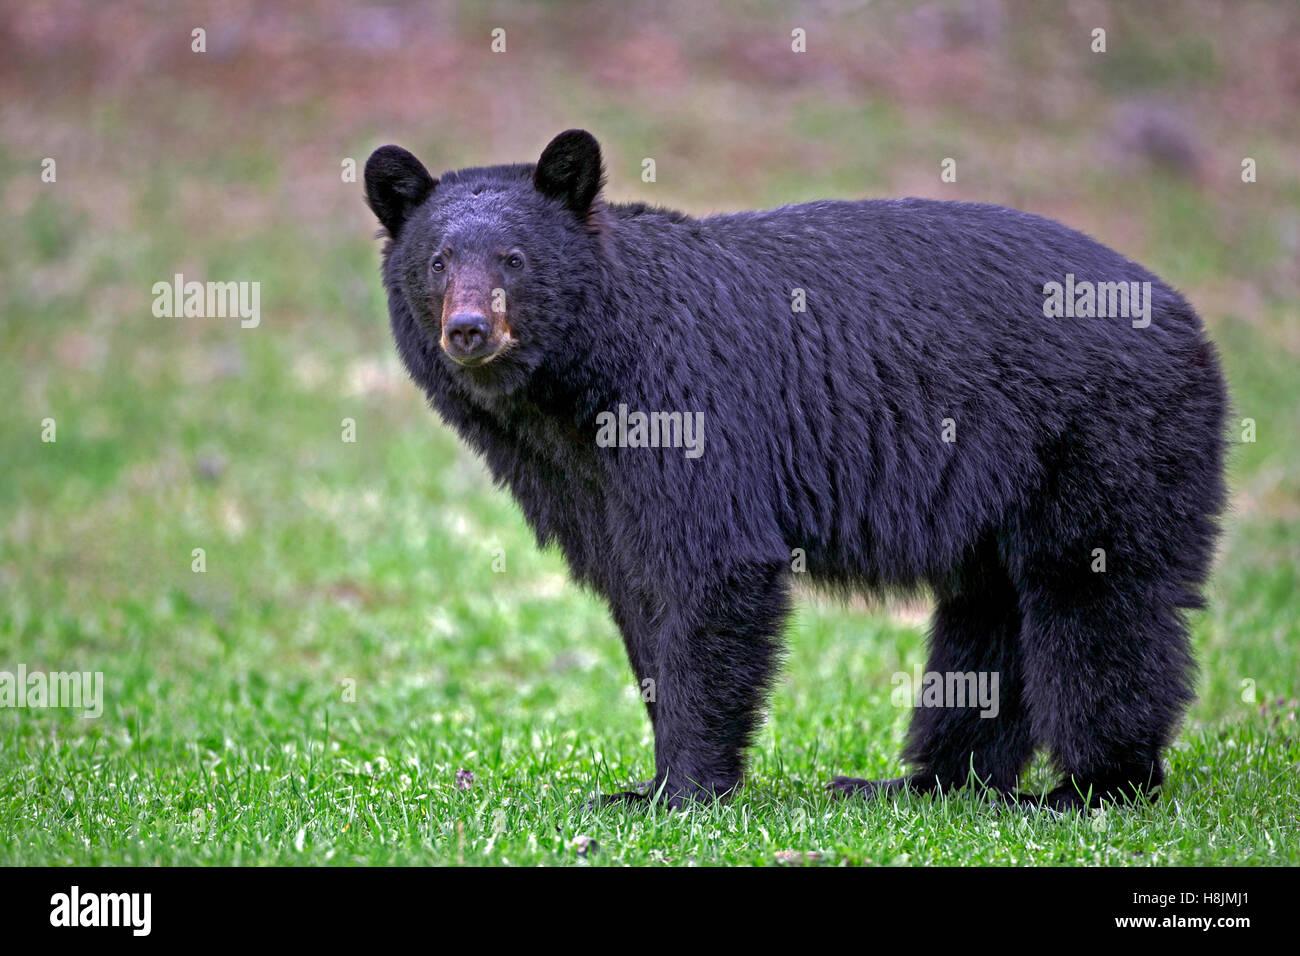 Black Bear standing in meadow, portrait  ( Ursus americanus ) - Stock Image